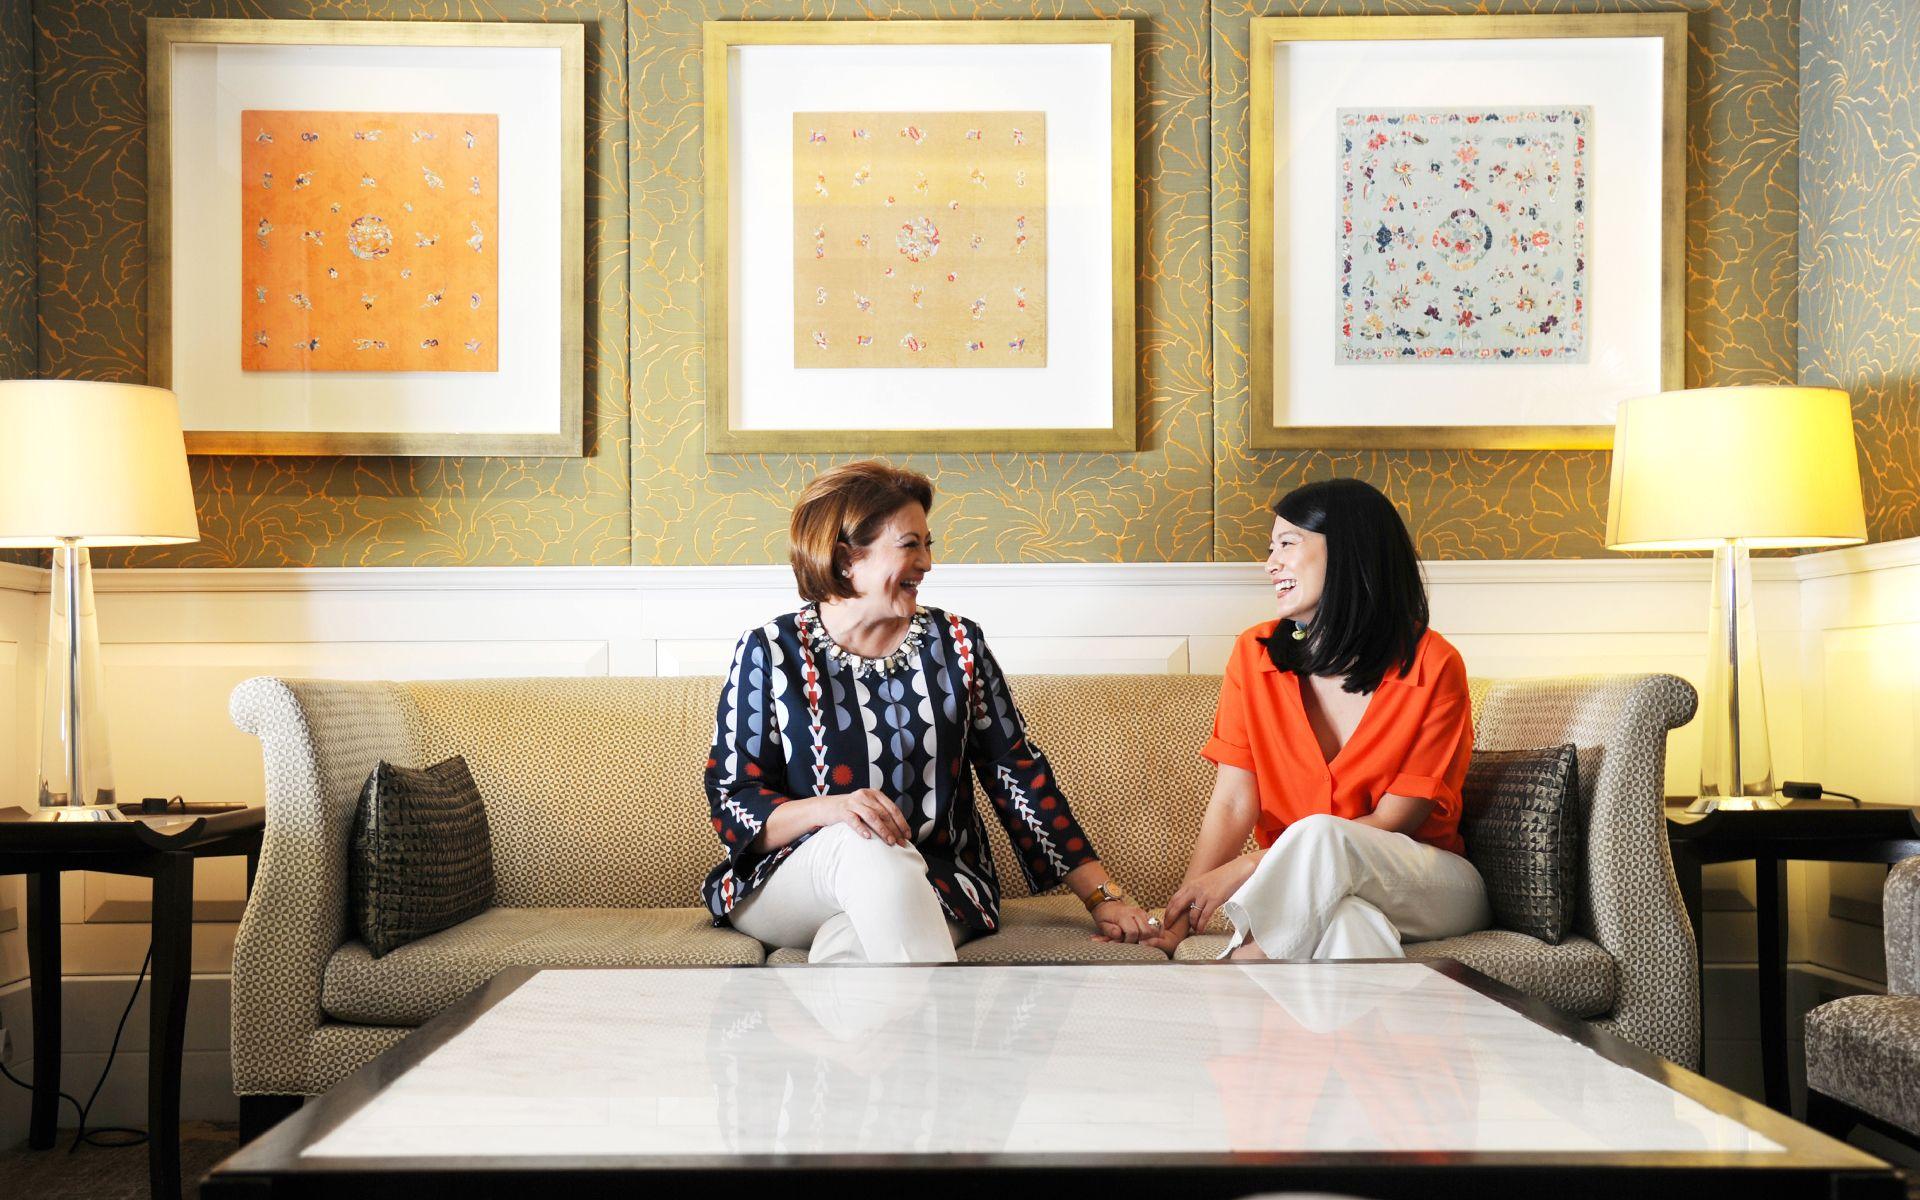 Tasha Fusil & Datin Jude Khadijah: Planning The Perfect Wedding Together